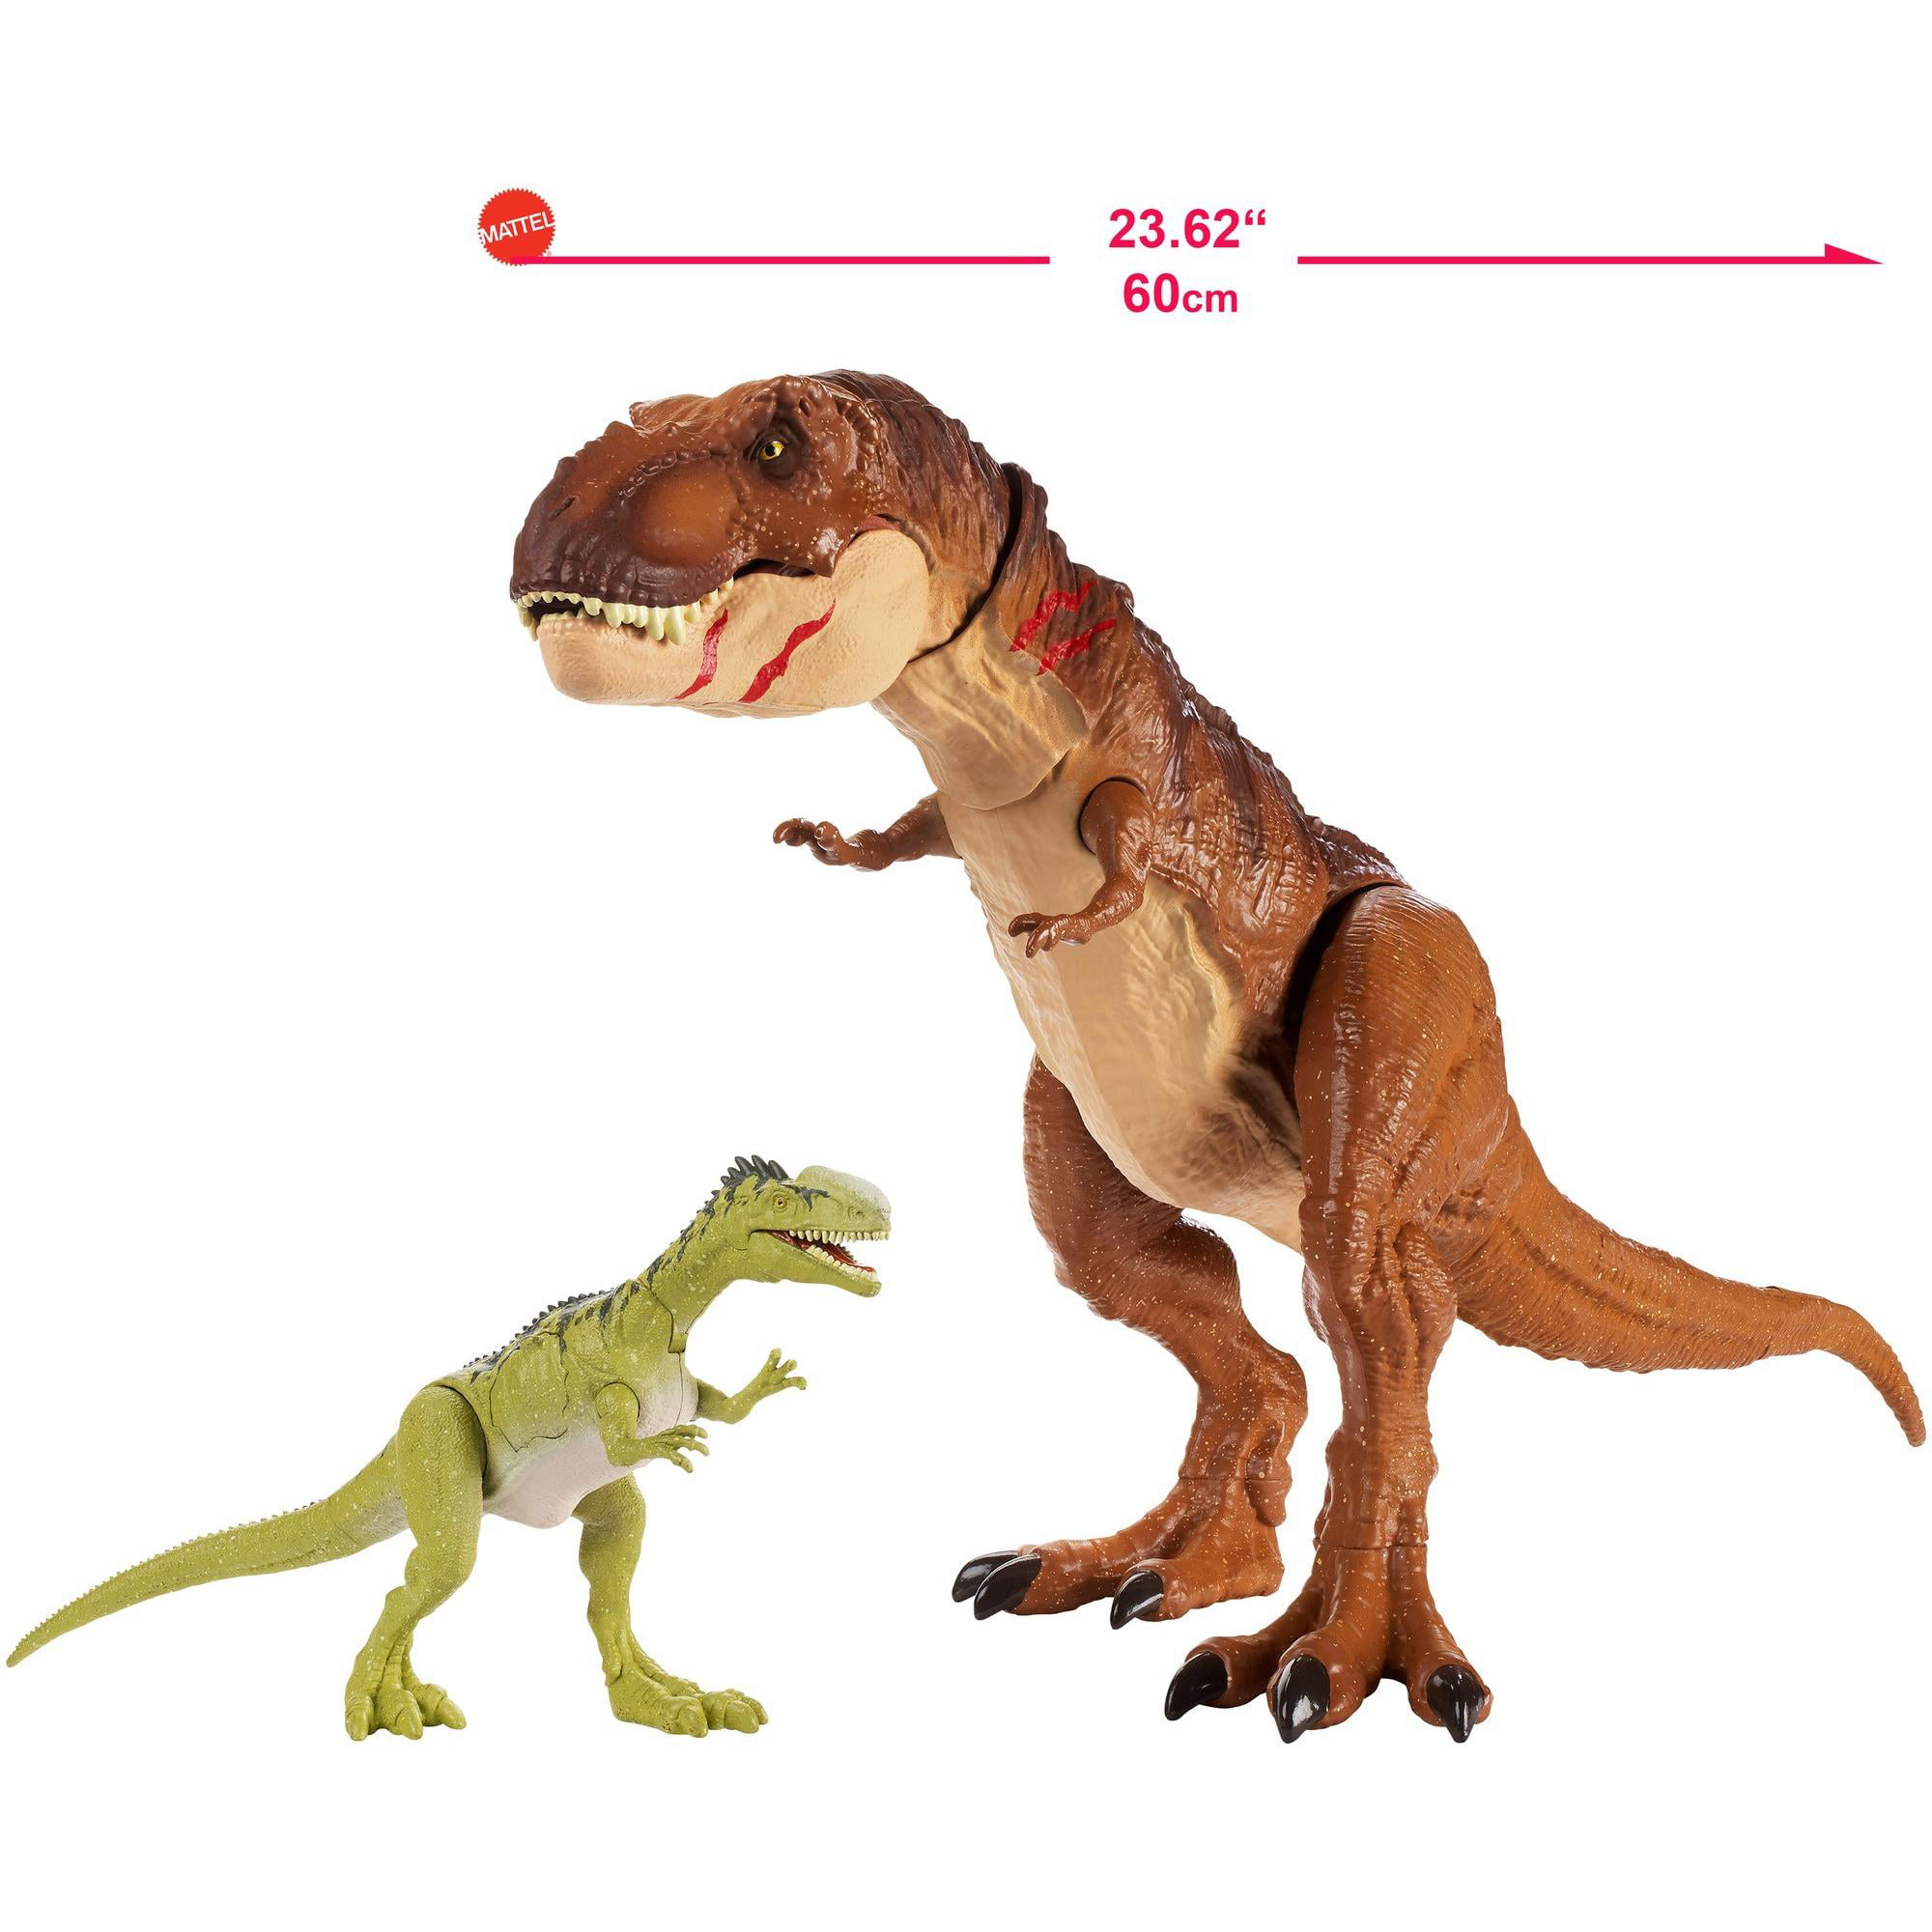 dans la main Jurassic WorldBattle Damage Spinosaurus WALMART EXCLUSIVE